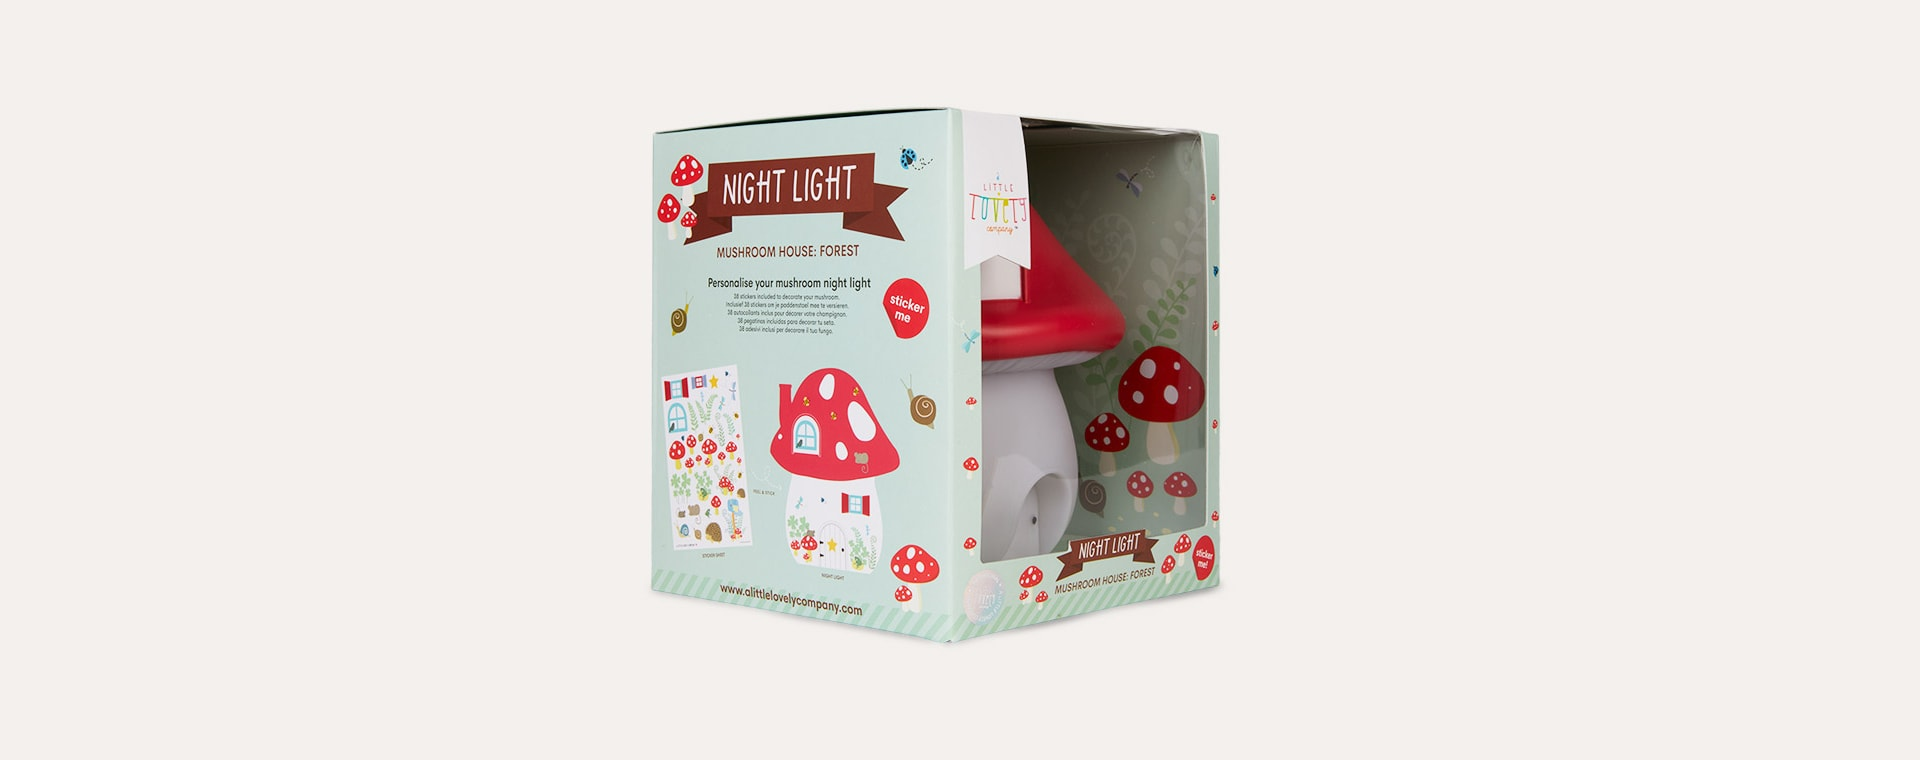 Forest A Little Lovely Company Mushroom House Nightlight